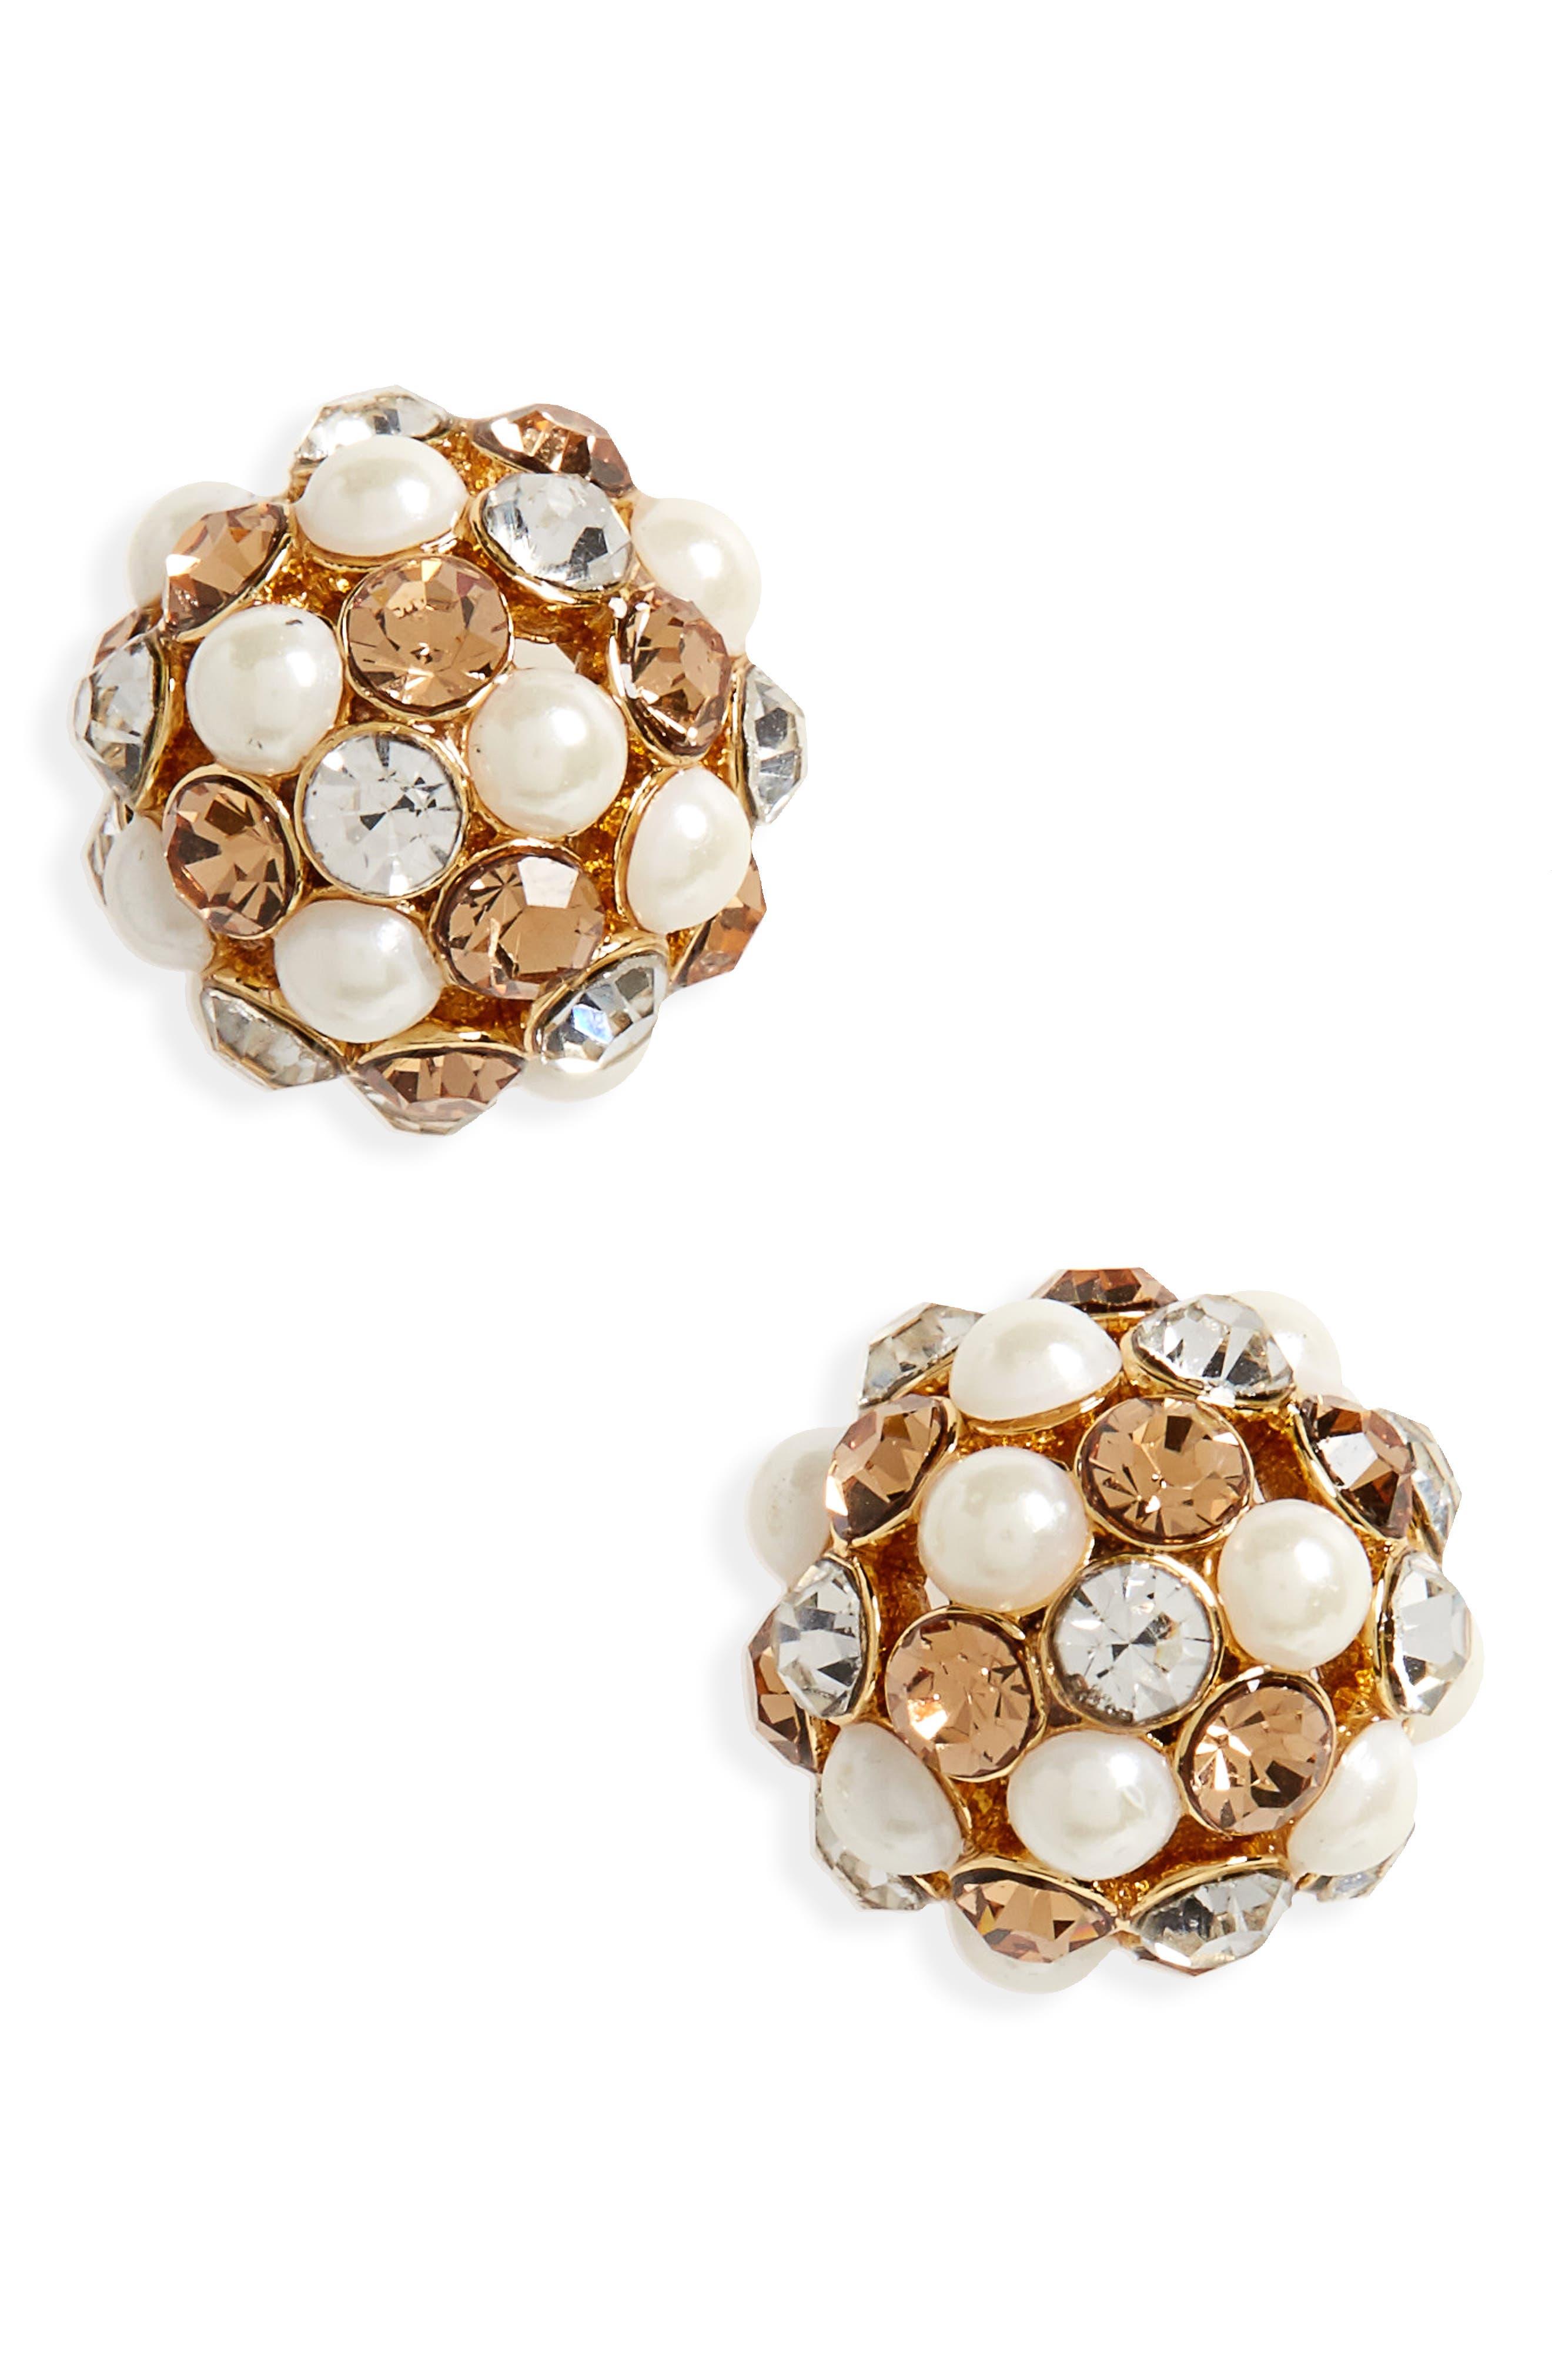 Main Image - kate spade new york ball stud earrings